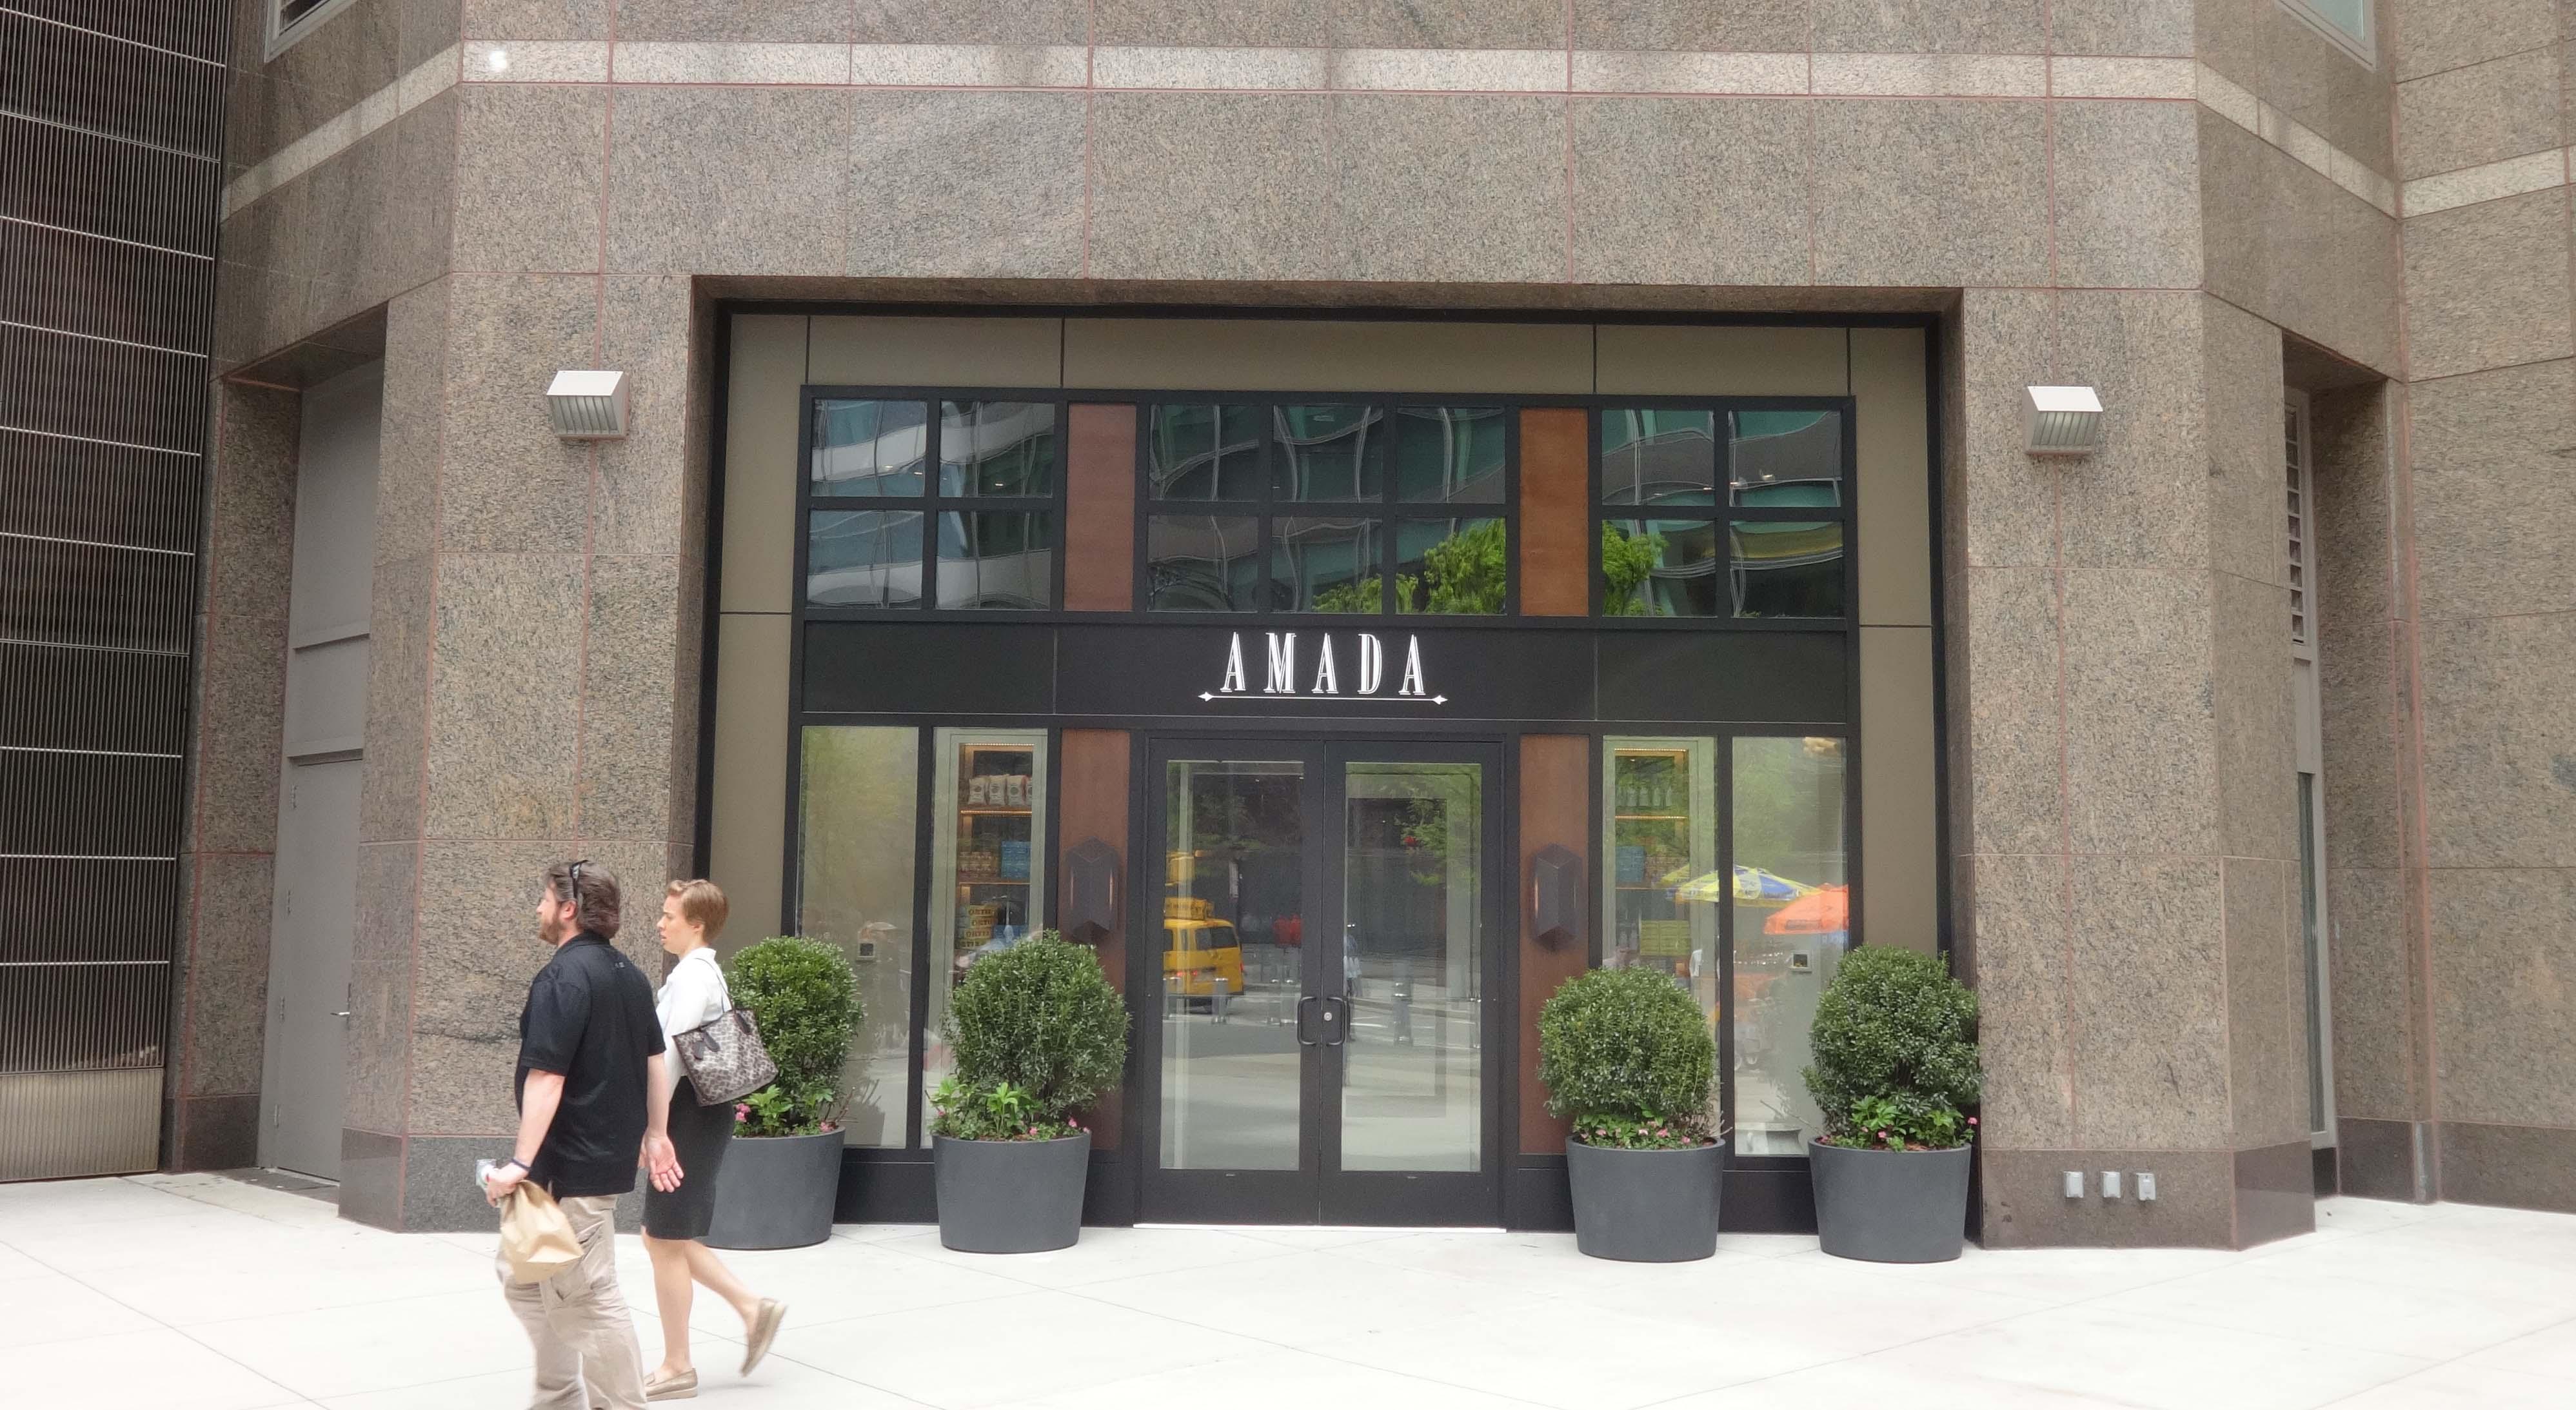 Amada main entrance